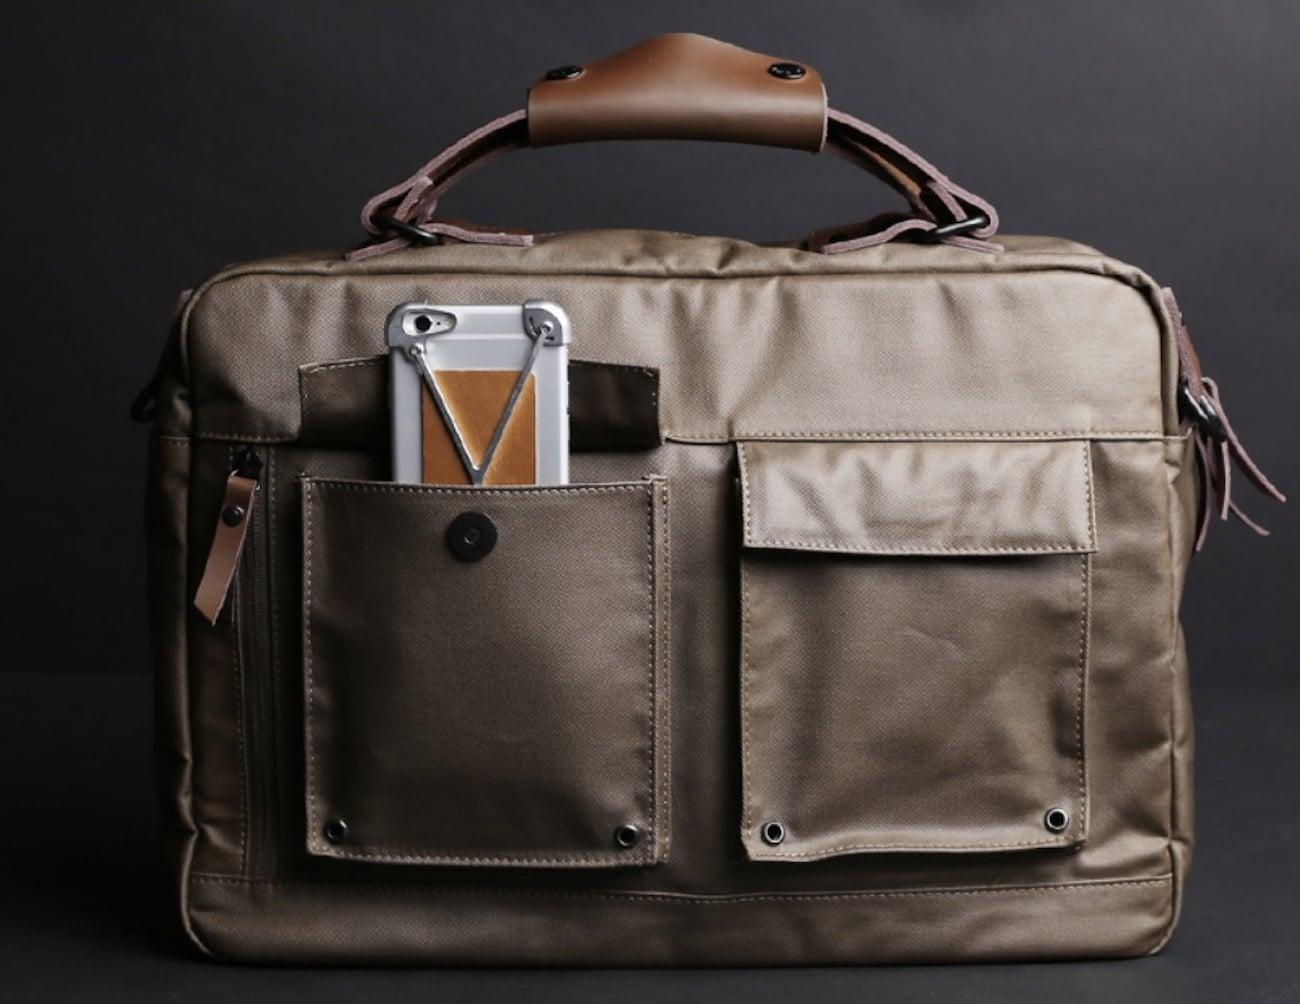 Everyday MacBook Messenger Bag